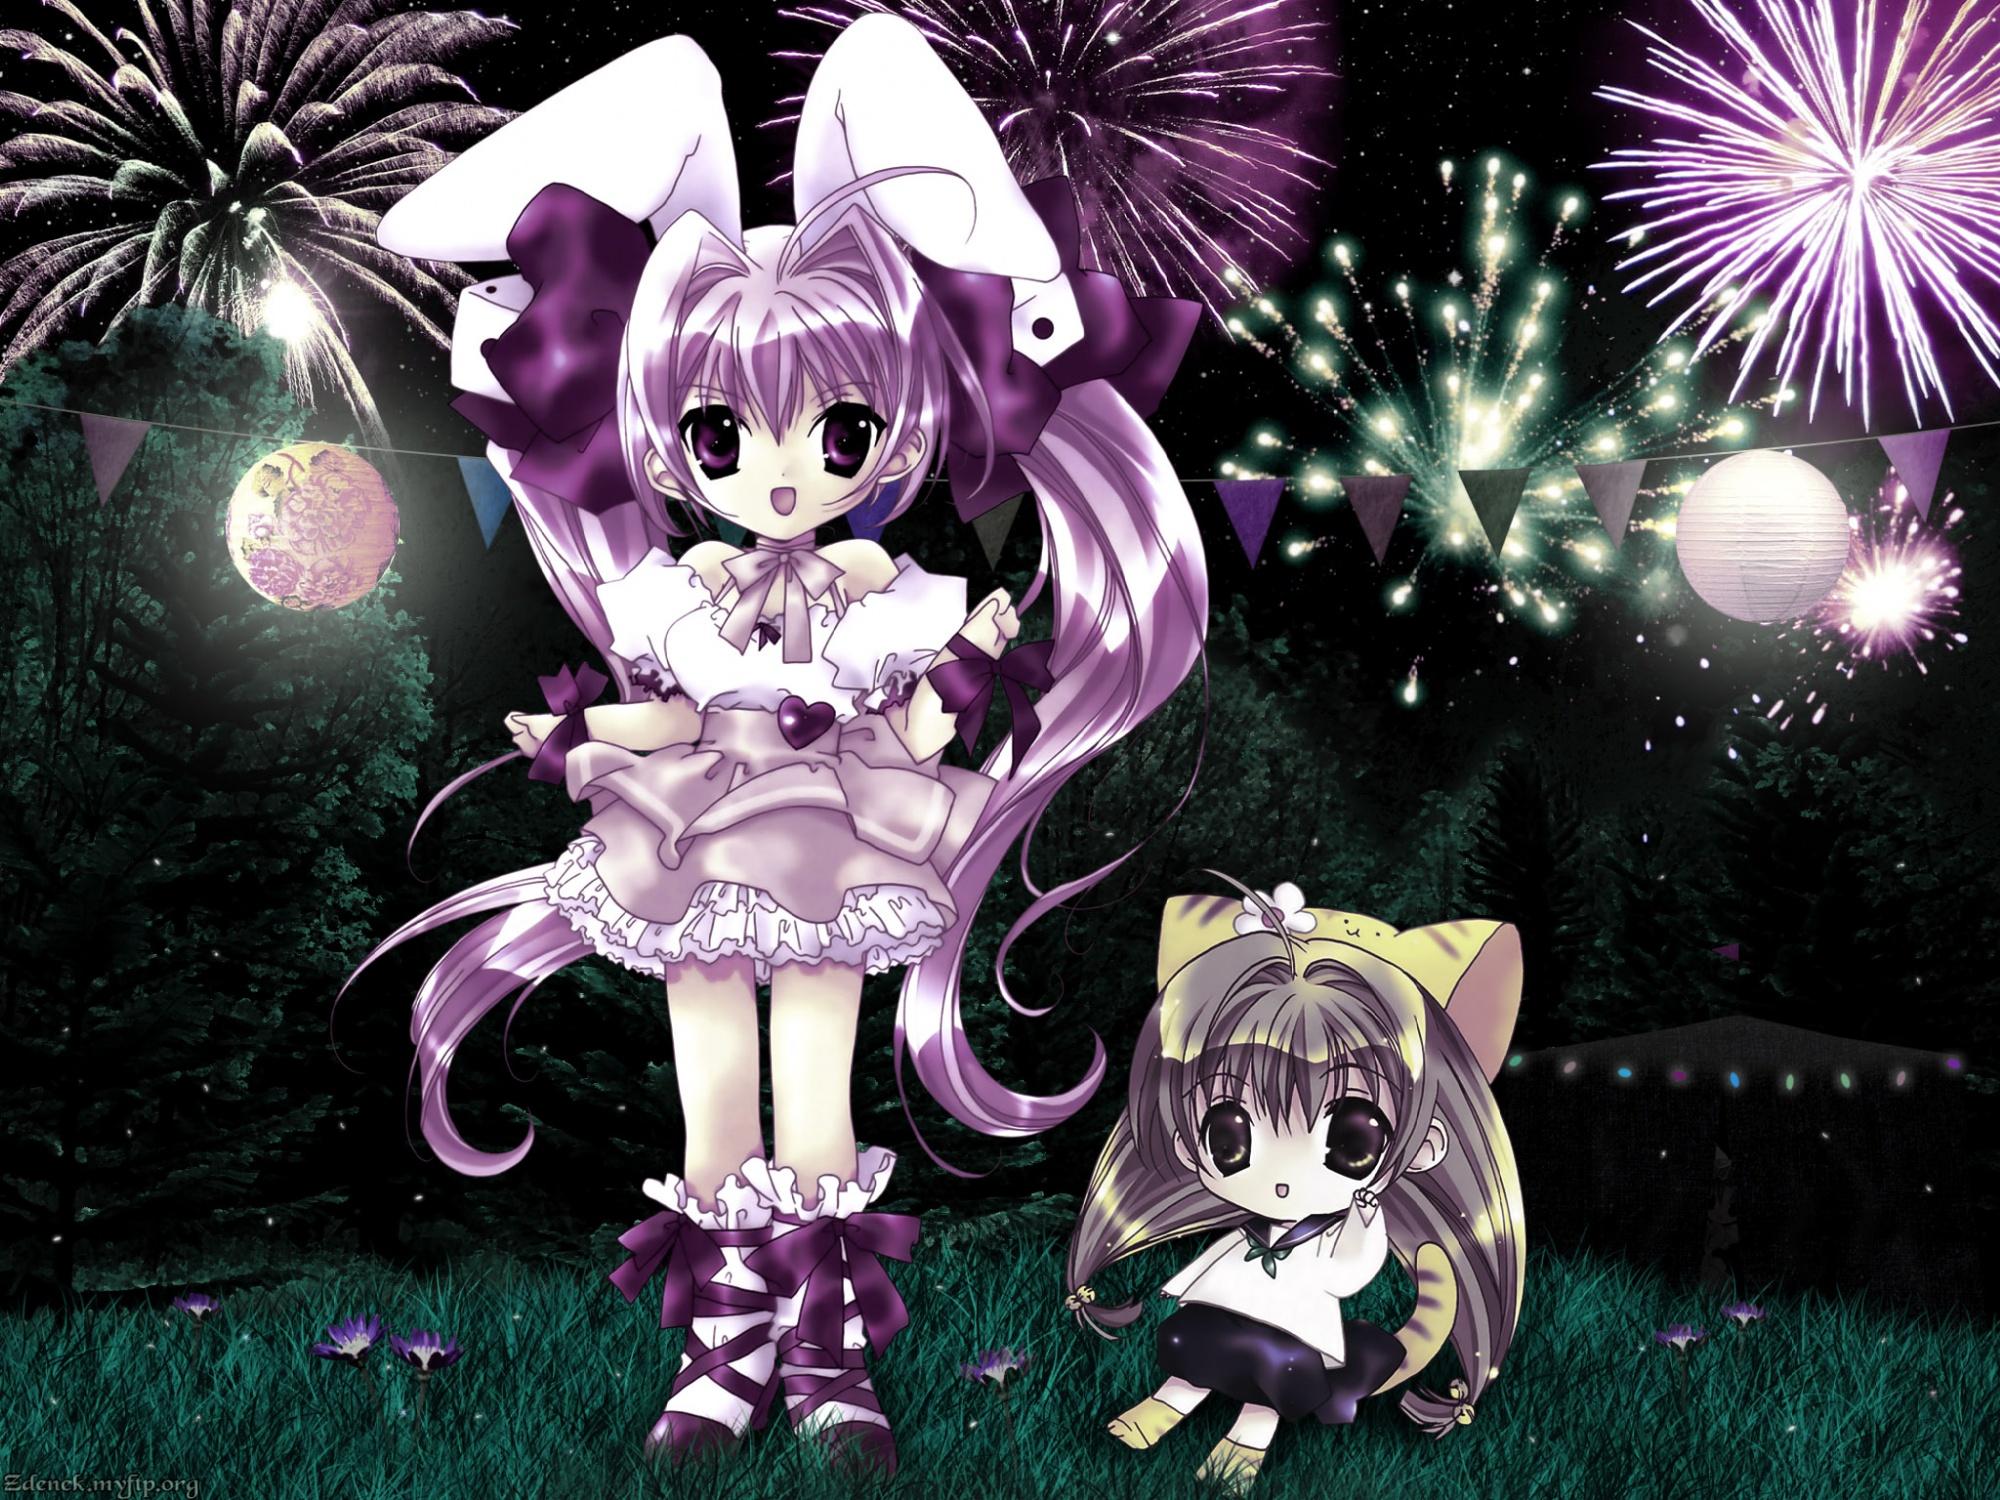 animal_ears bunny_ears chibi di_gi_charat fireworks puchiko usada_hikaru